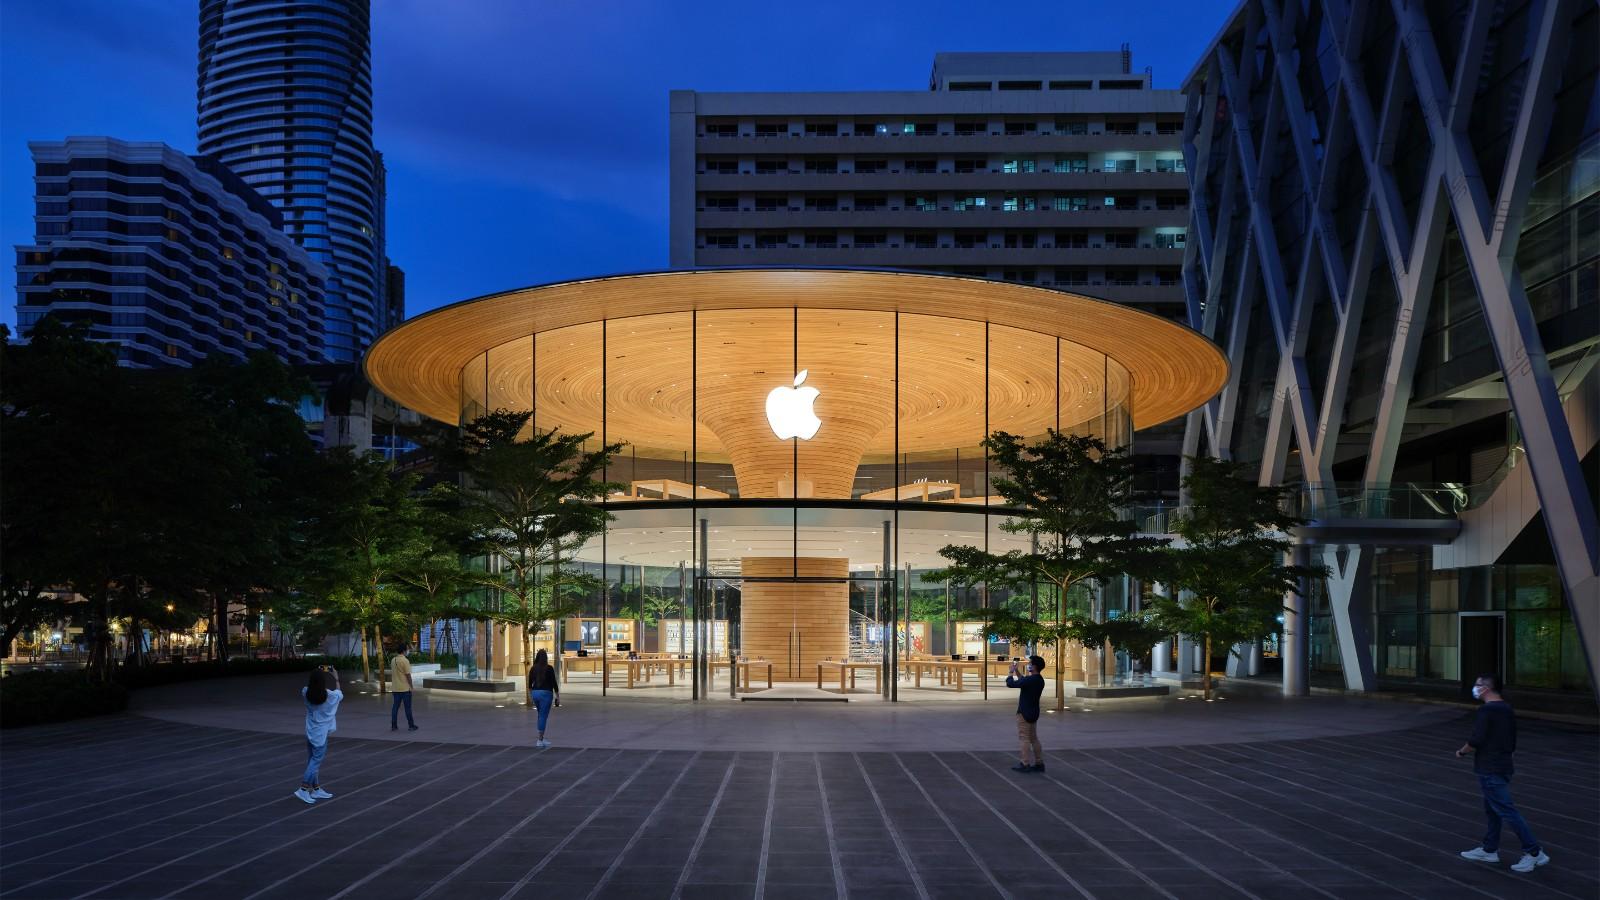 Apple Central World 的户外广场和主外观。.jpg